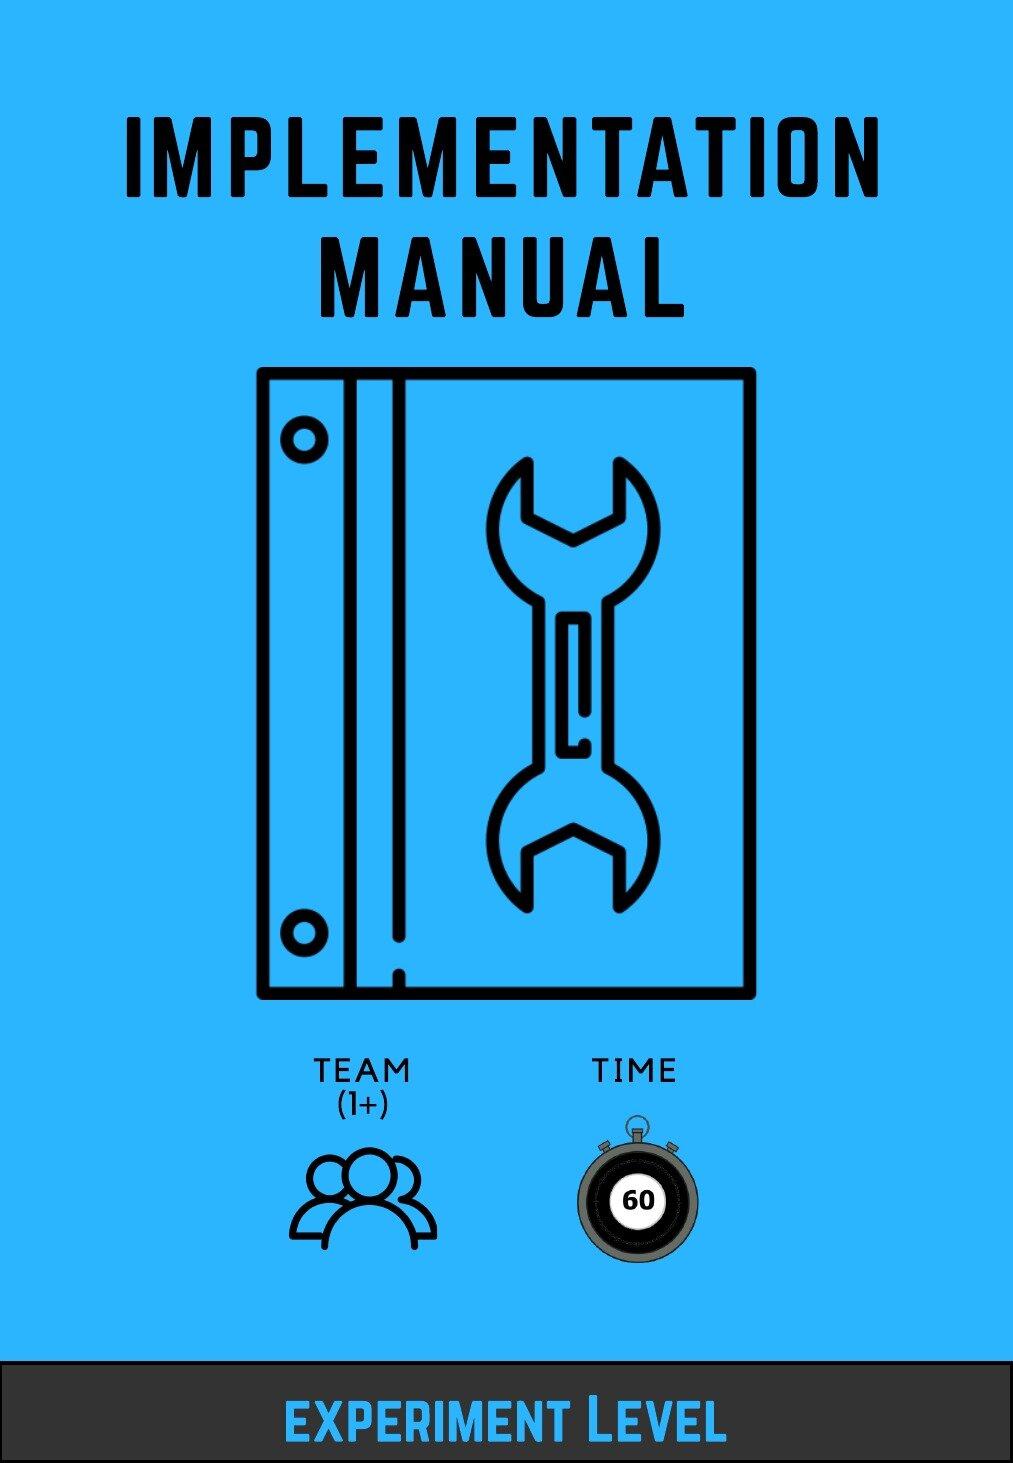 ImplementationManual.jpeg